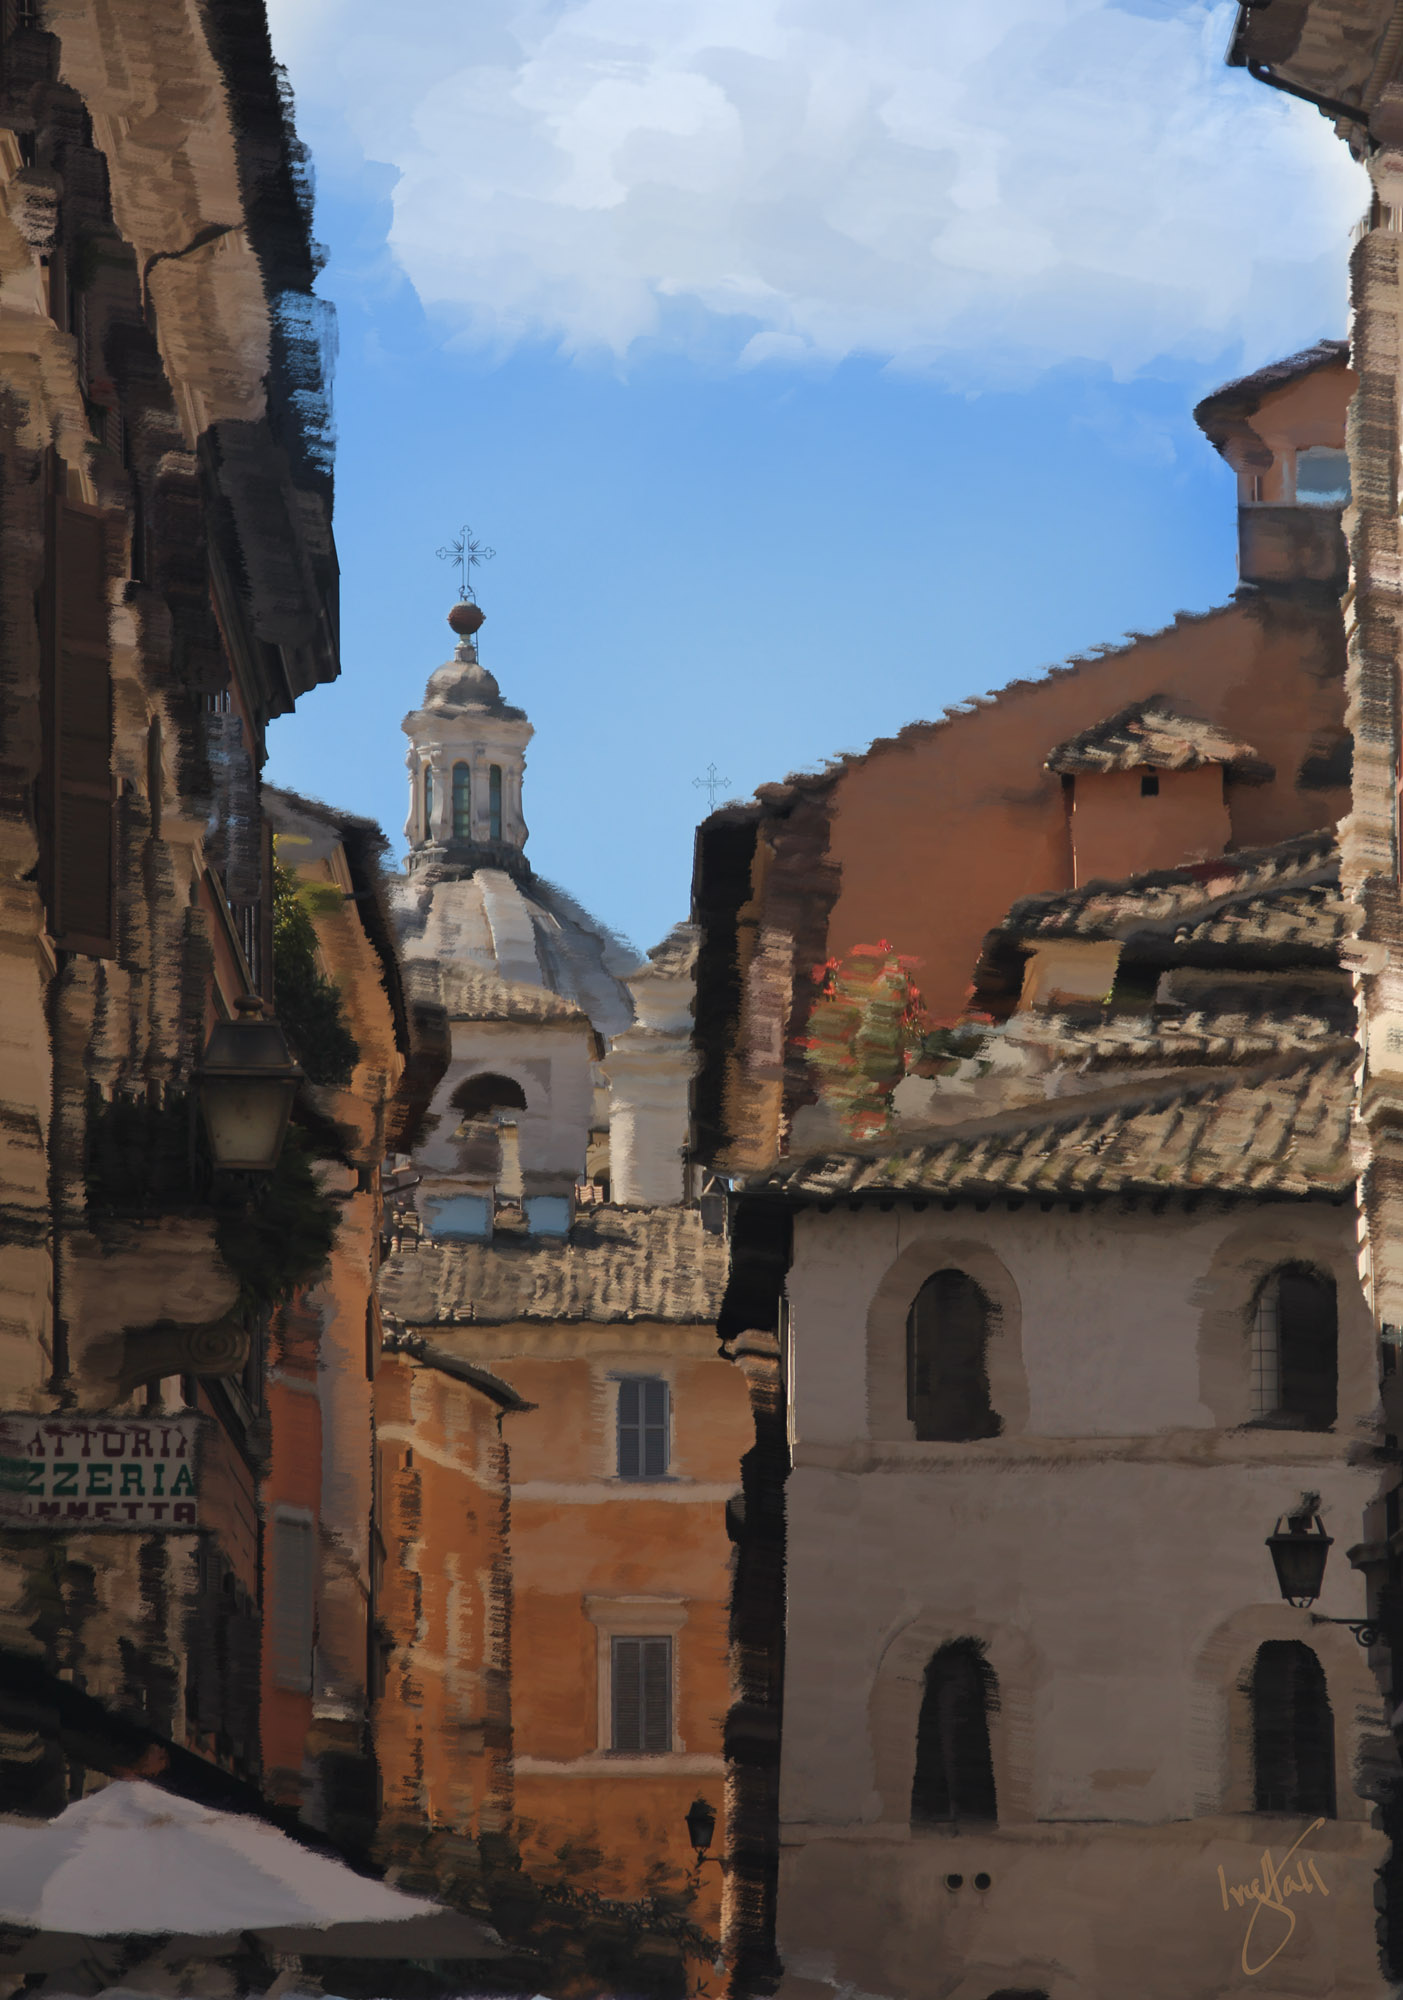 031_Rome_205_P.jpg